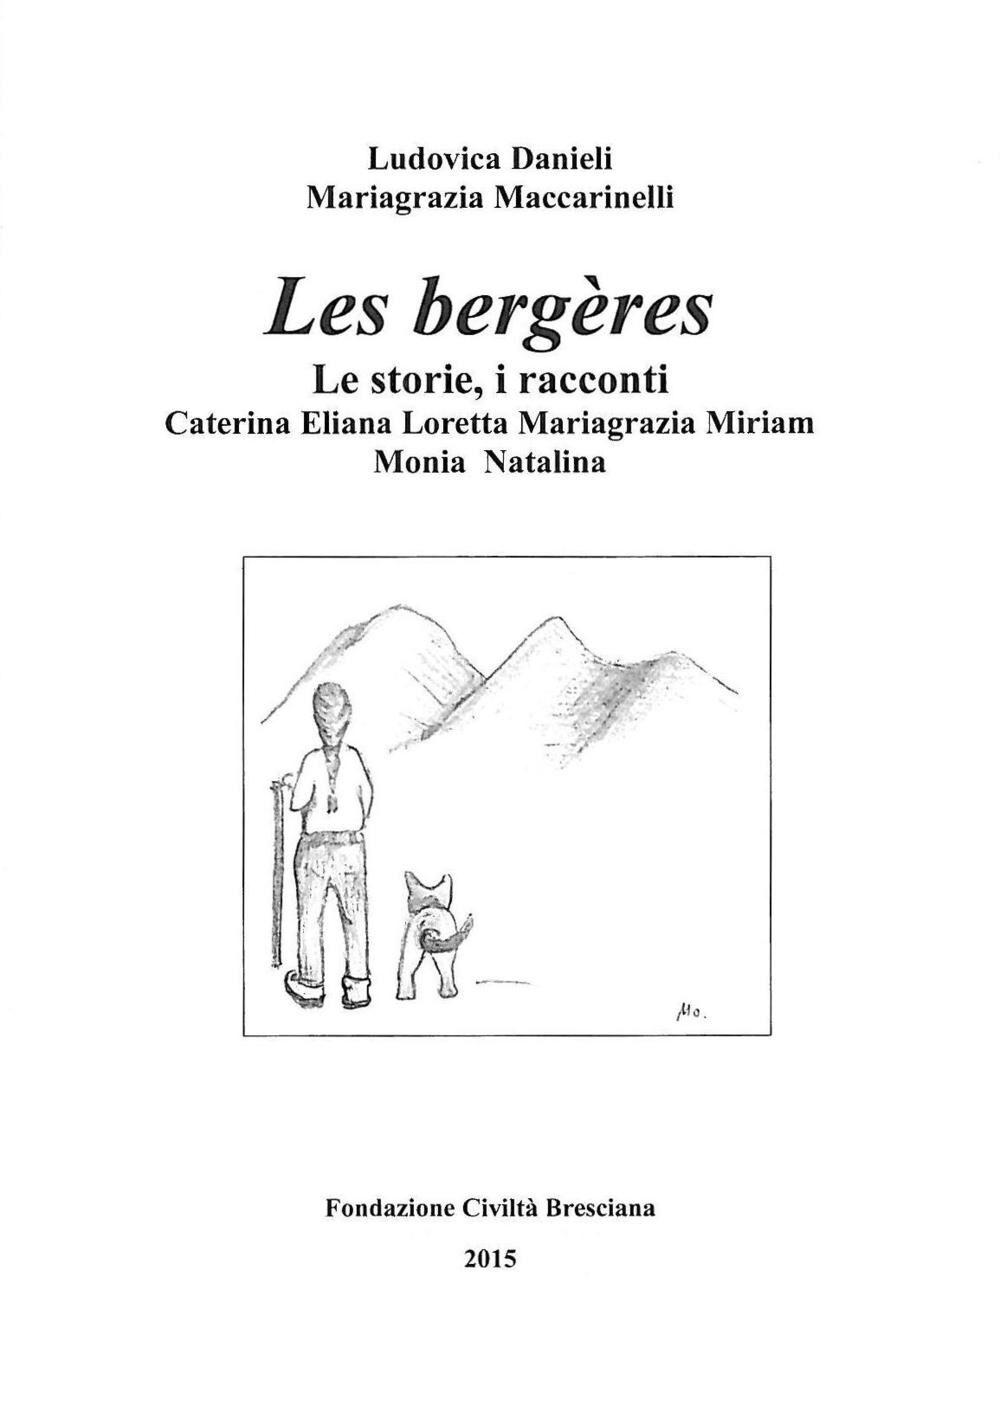 Les bergères. Le storie, i racconti: Caterina, Eliana, Loretta, Mariagrazia, Miriam, Monia, Natalina